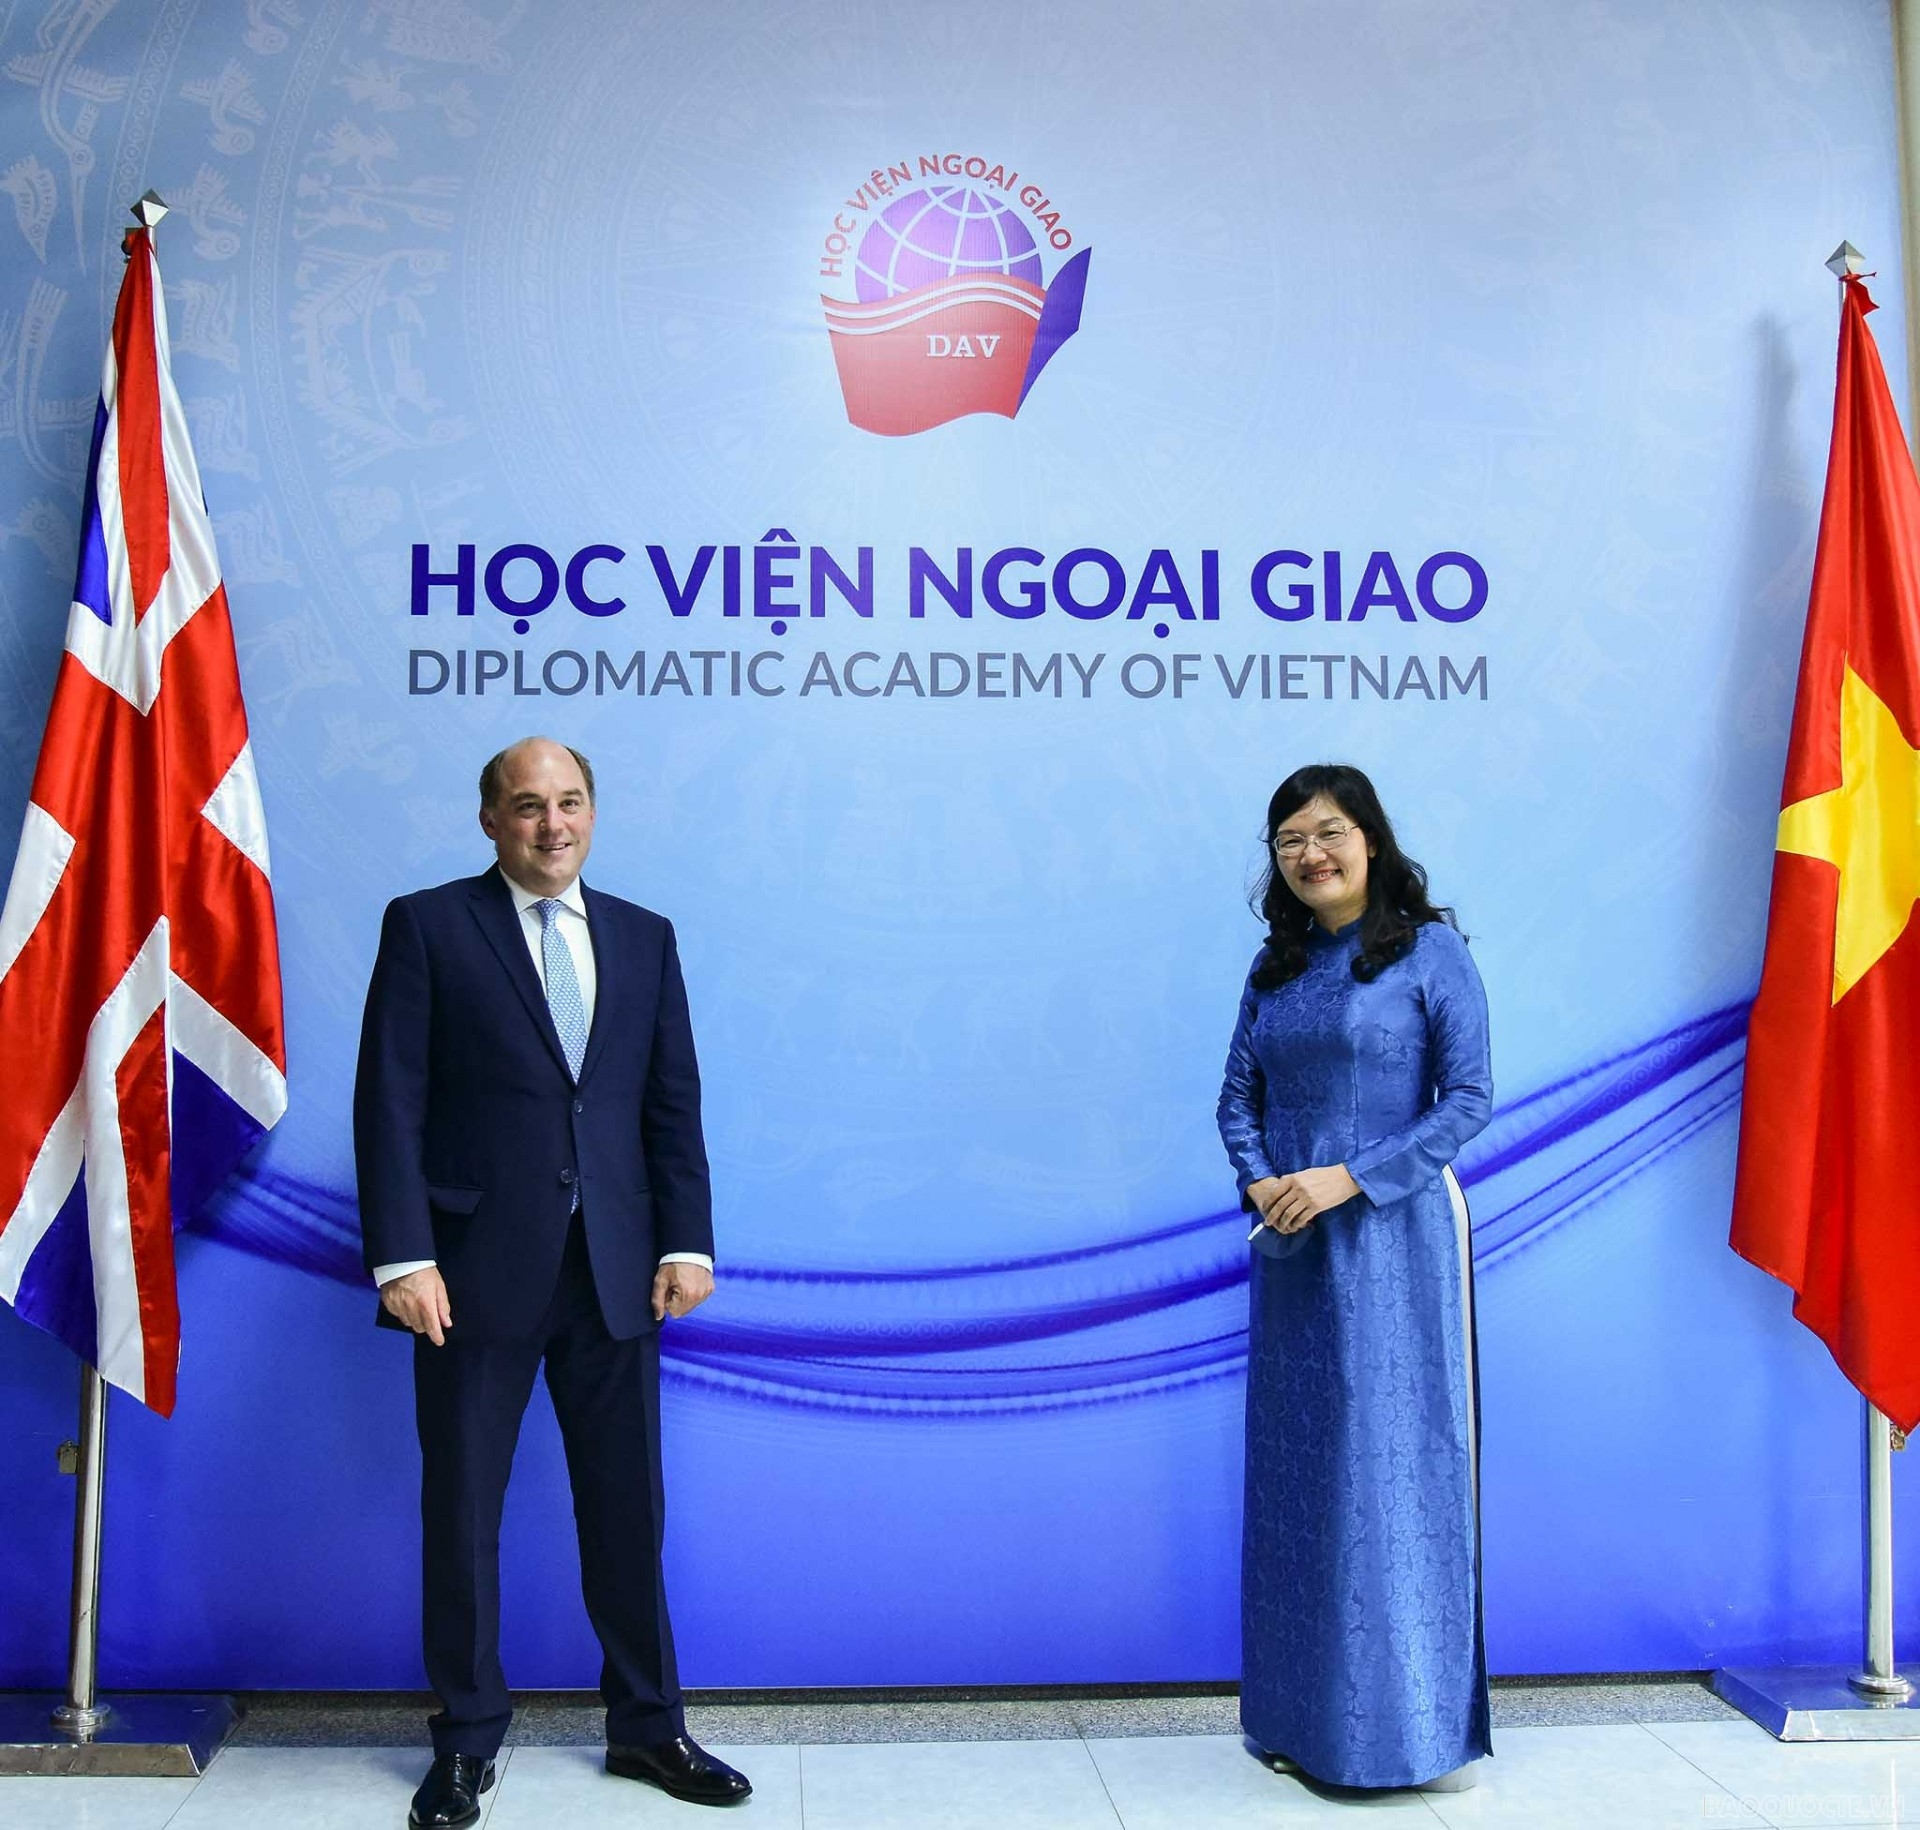 UK Defense Secretary Praises Vietnam's Increasing Role In The Region And The World